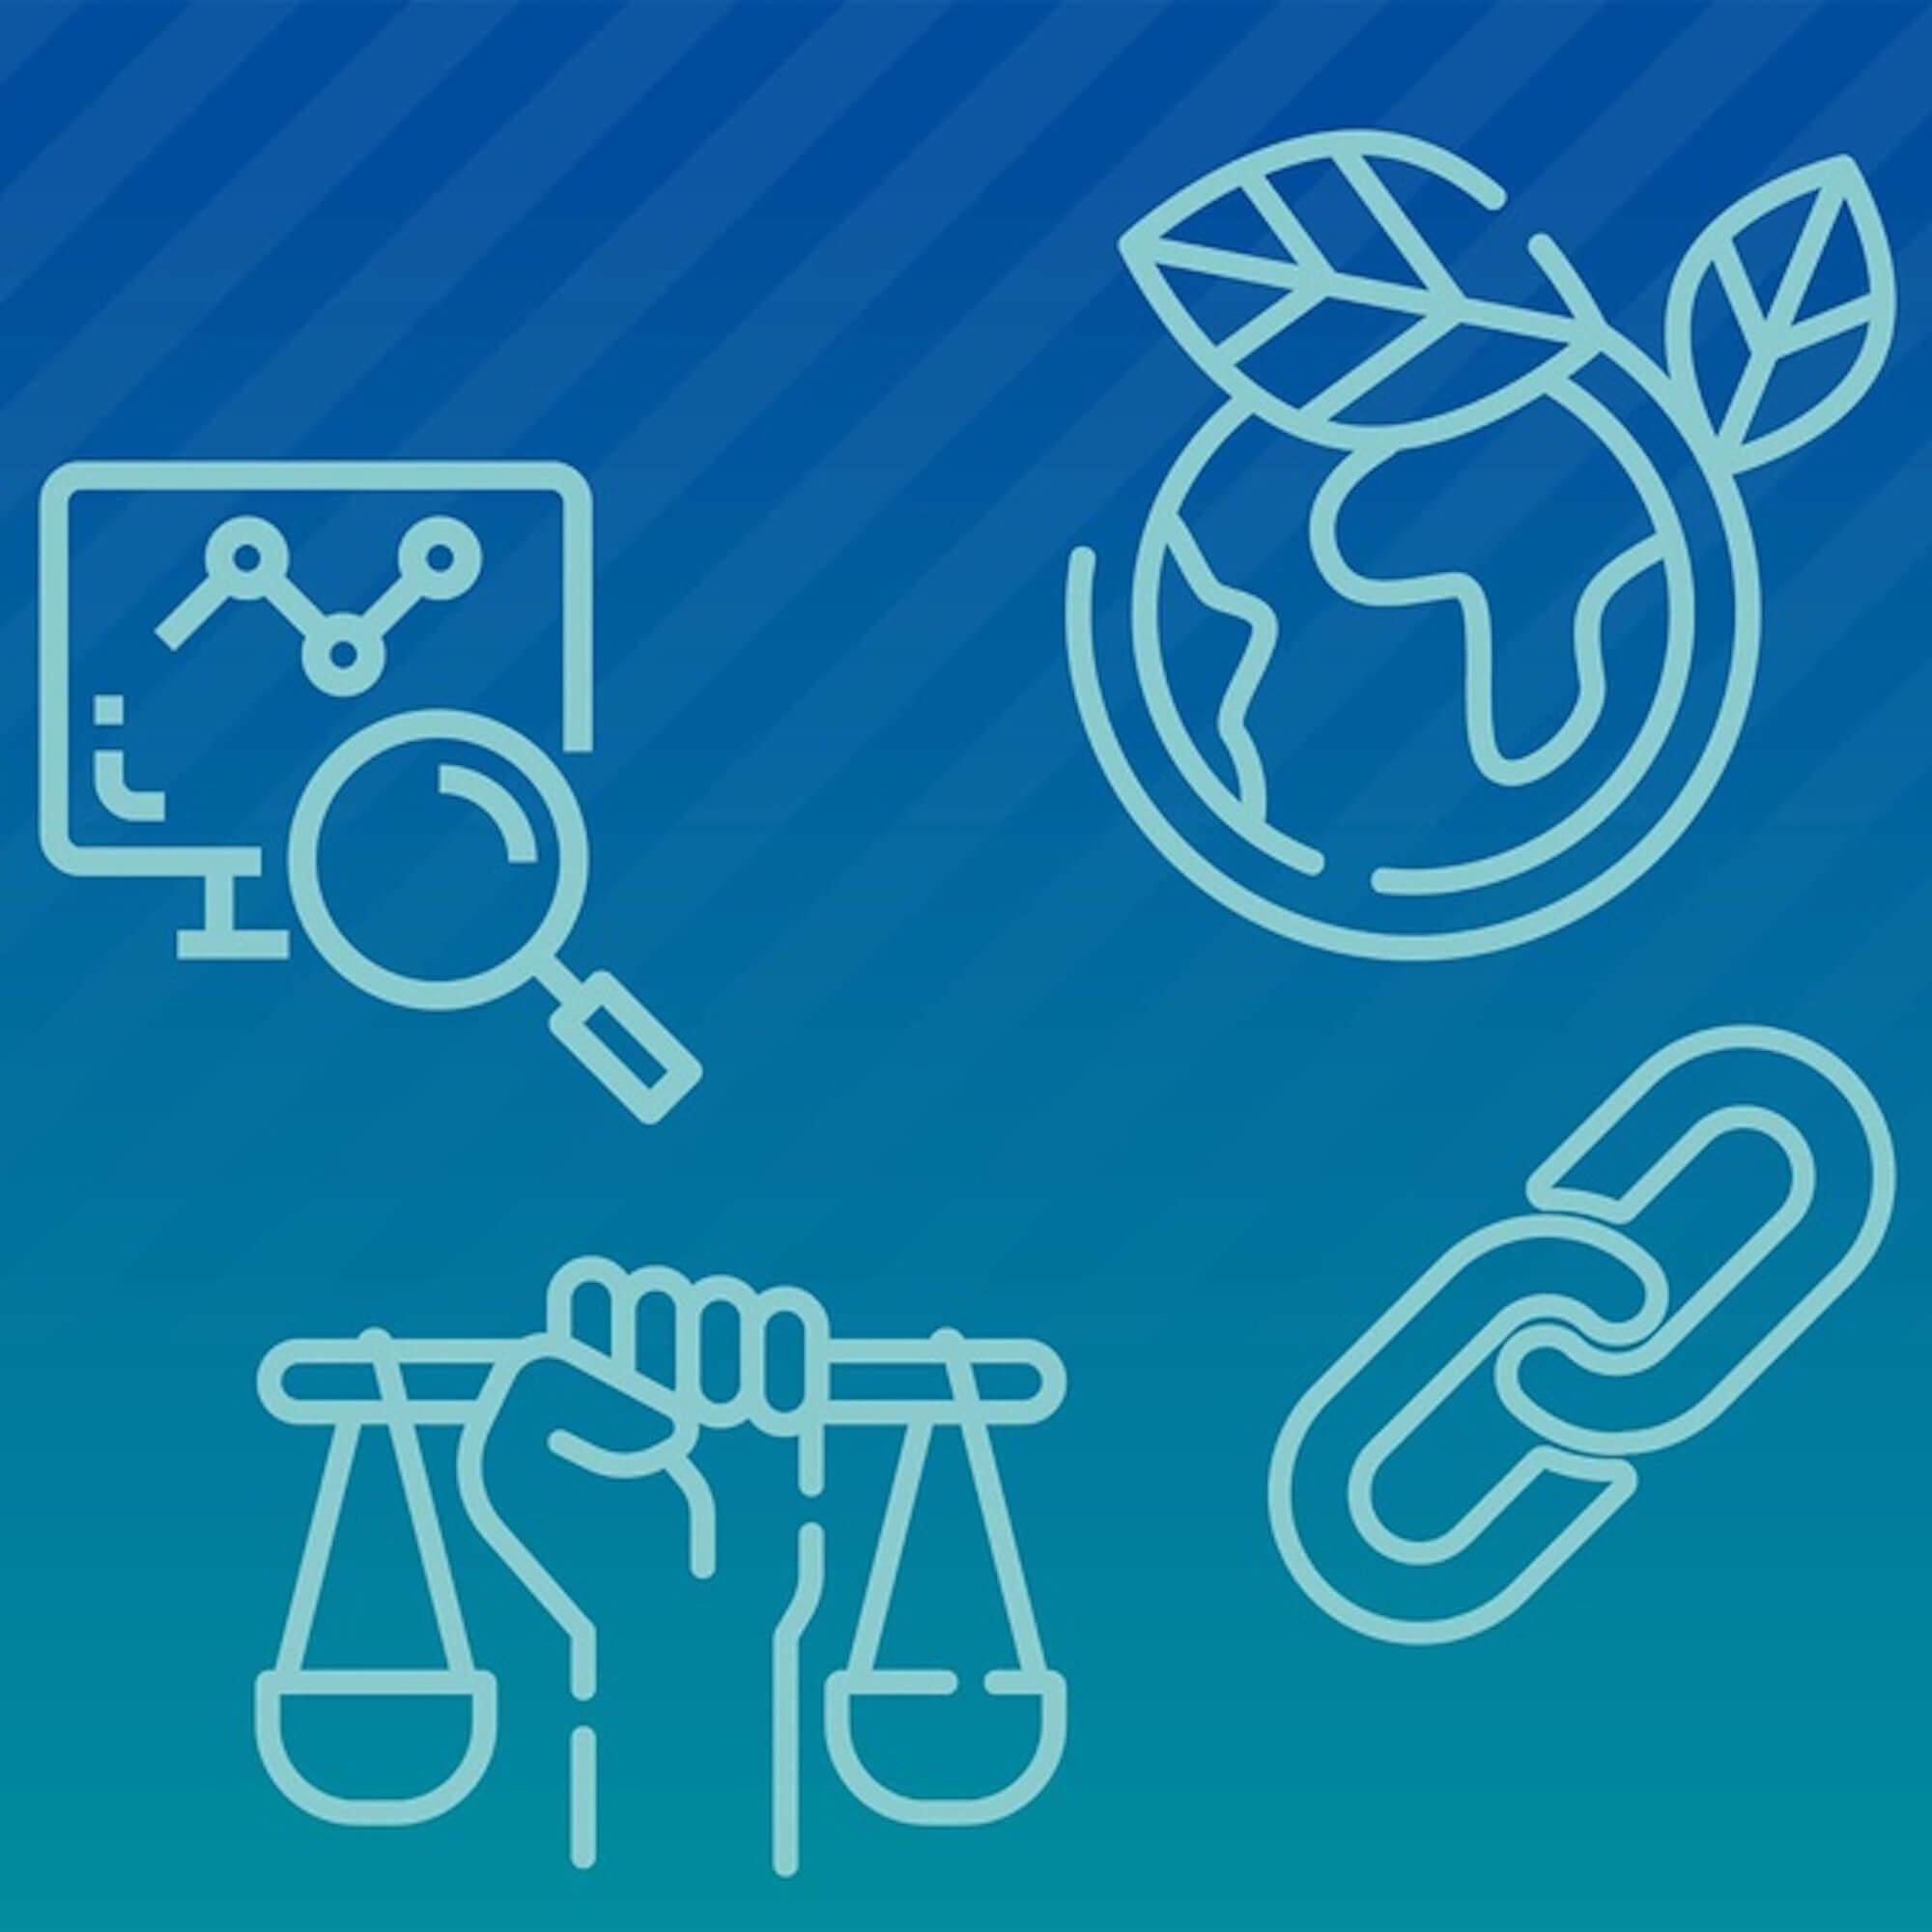 Icons symbolising teaching